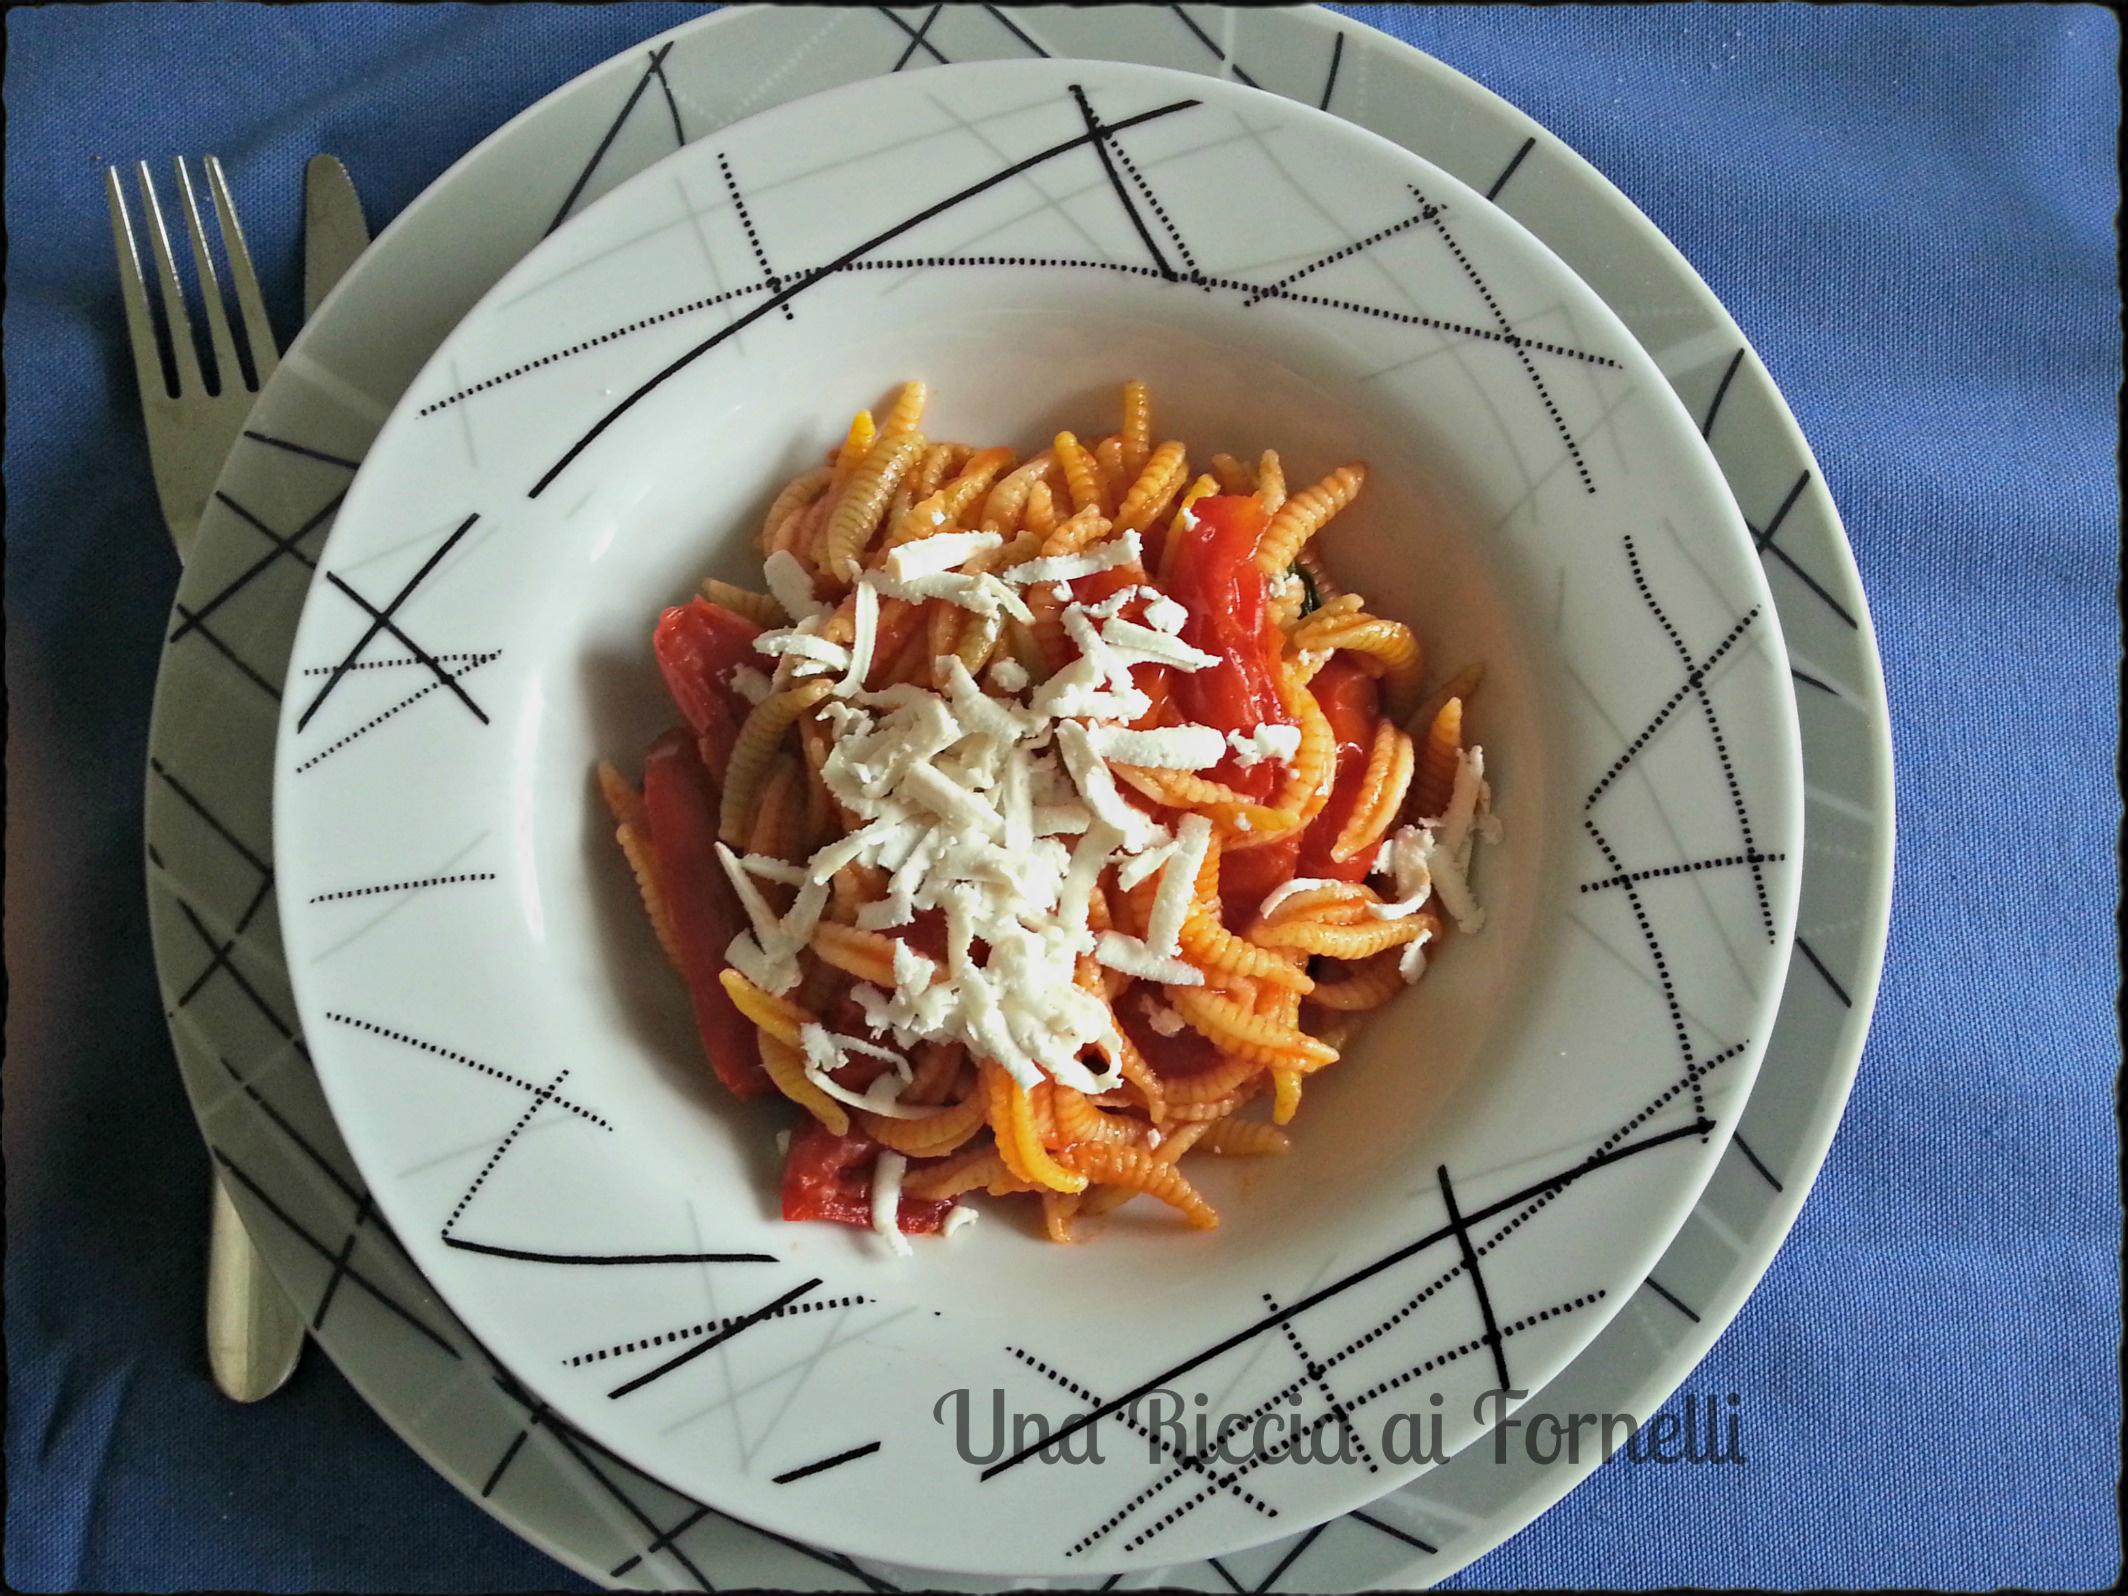 Ricetta Gnocchi Con Ricotta Salata.Gnocchetti Sardi Alla Ricotta Salata Ricetta Primo Veloce